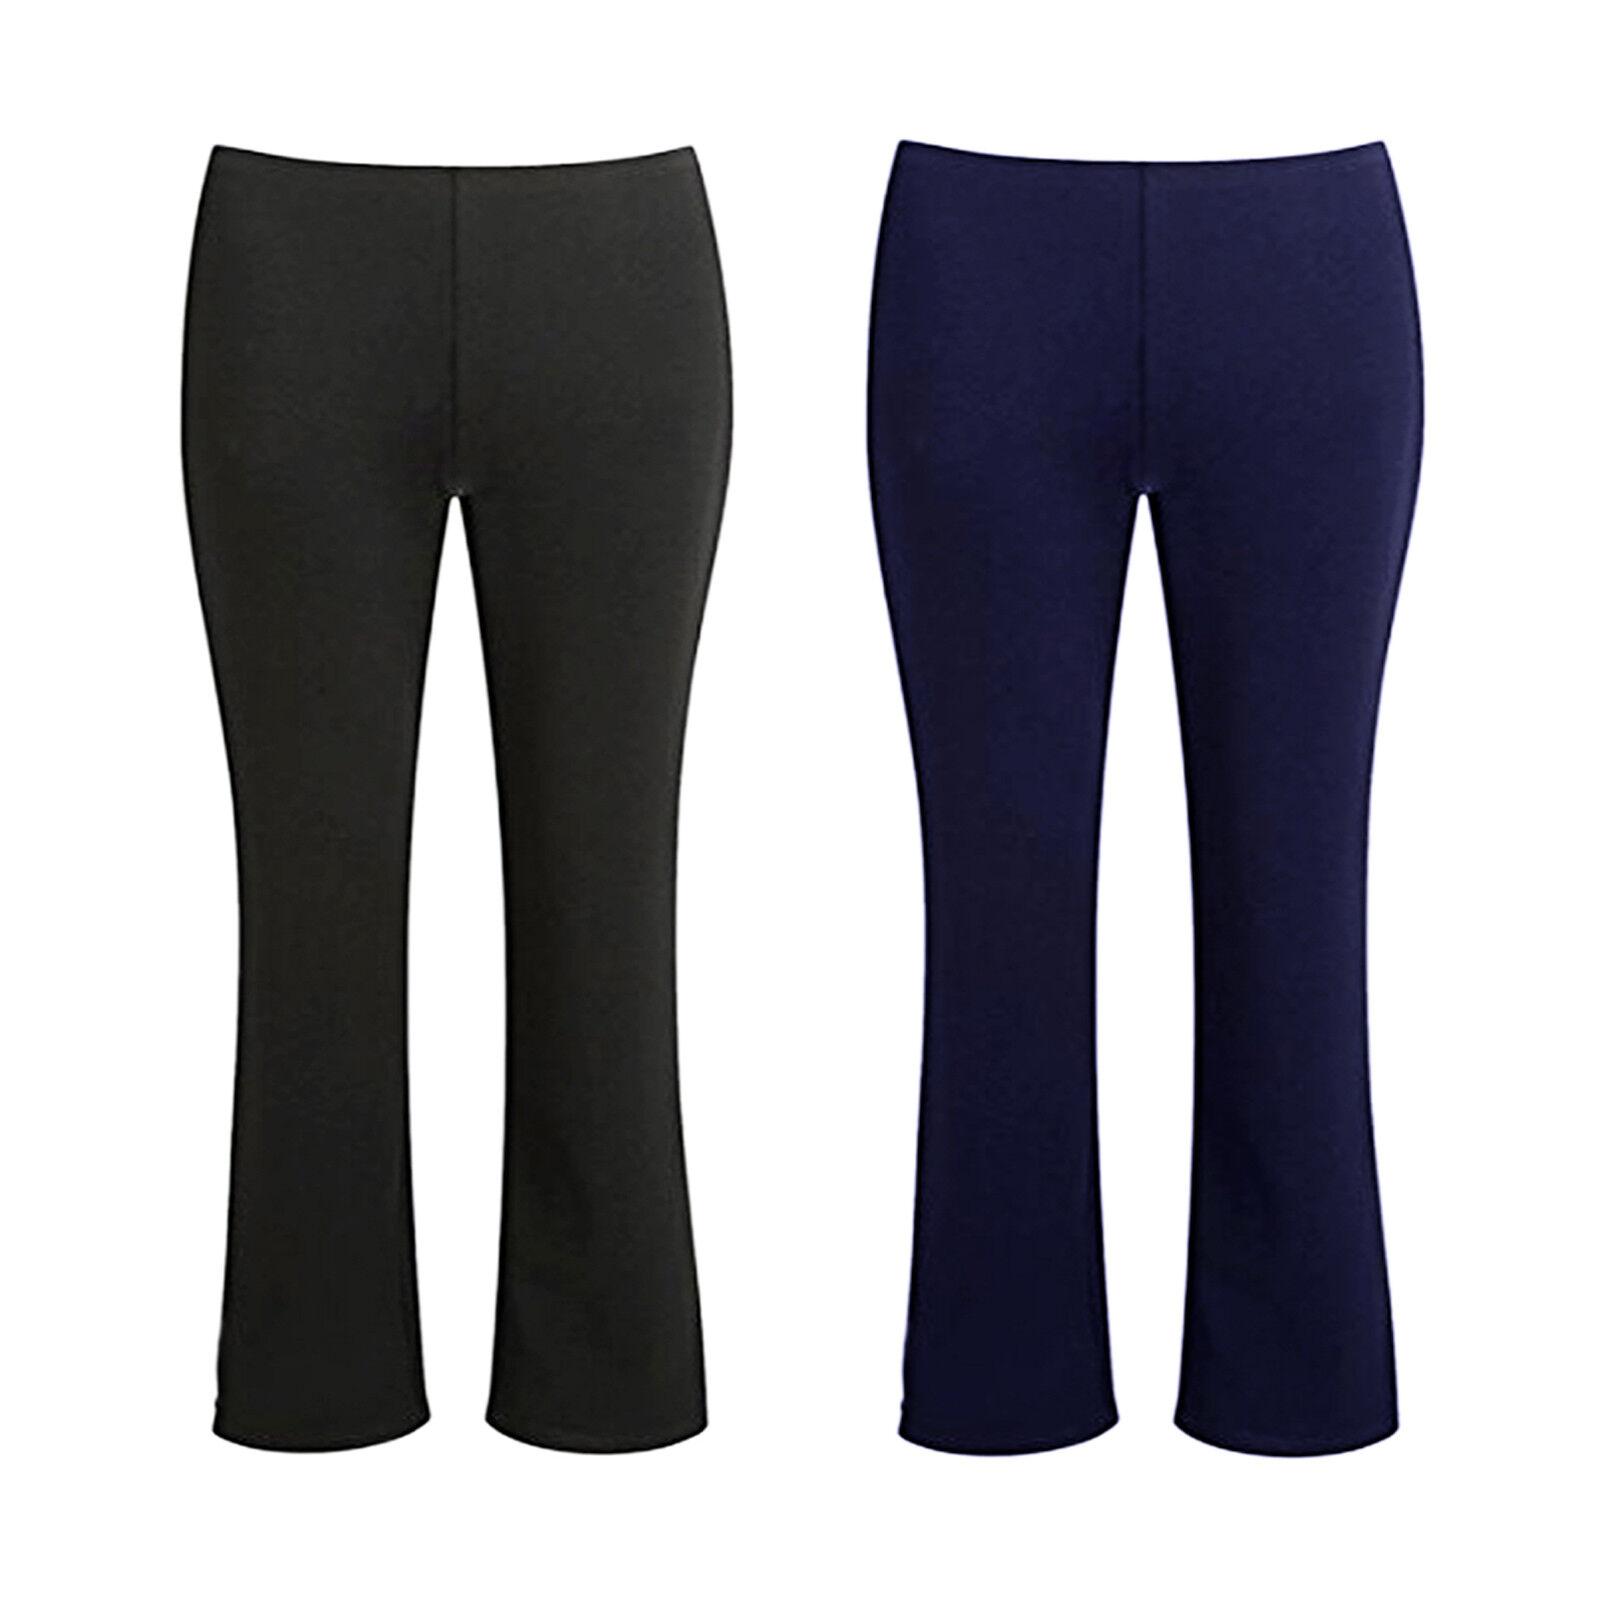 Girls Elasticated Waist Pull On Stretch School Trouser Only Uniform® UK